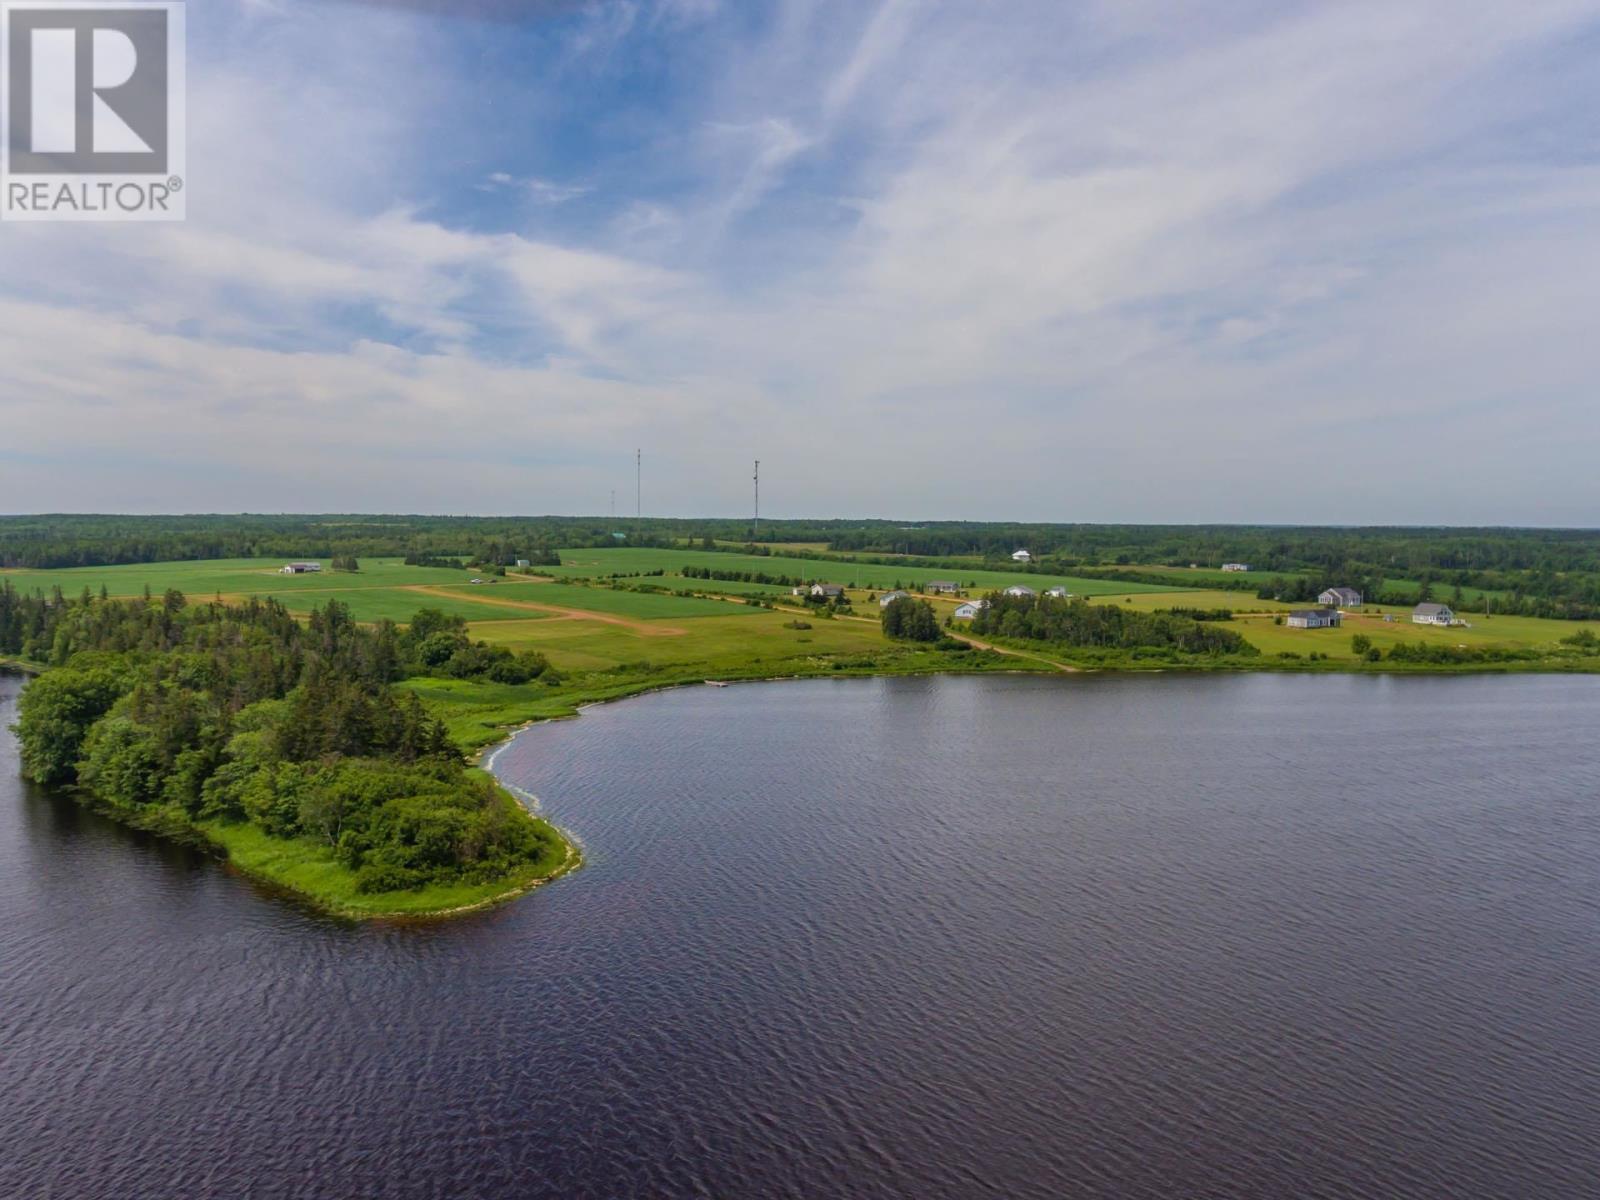 Lot 2 Majestic View Lane, Lakeside, Prince Edward Island  C0A 1S0 - Photo 10 - 202118512